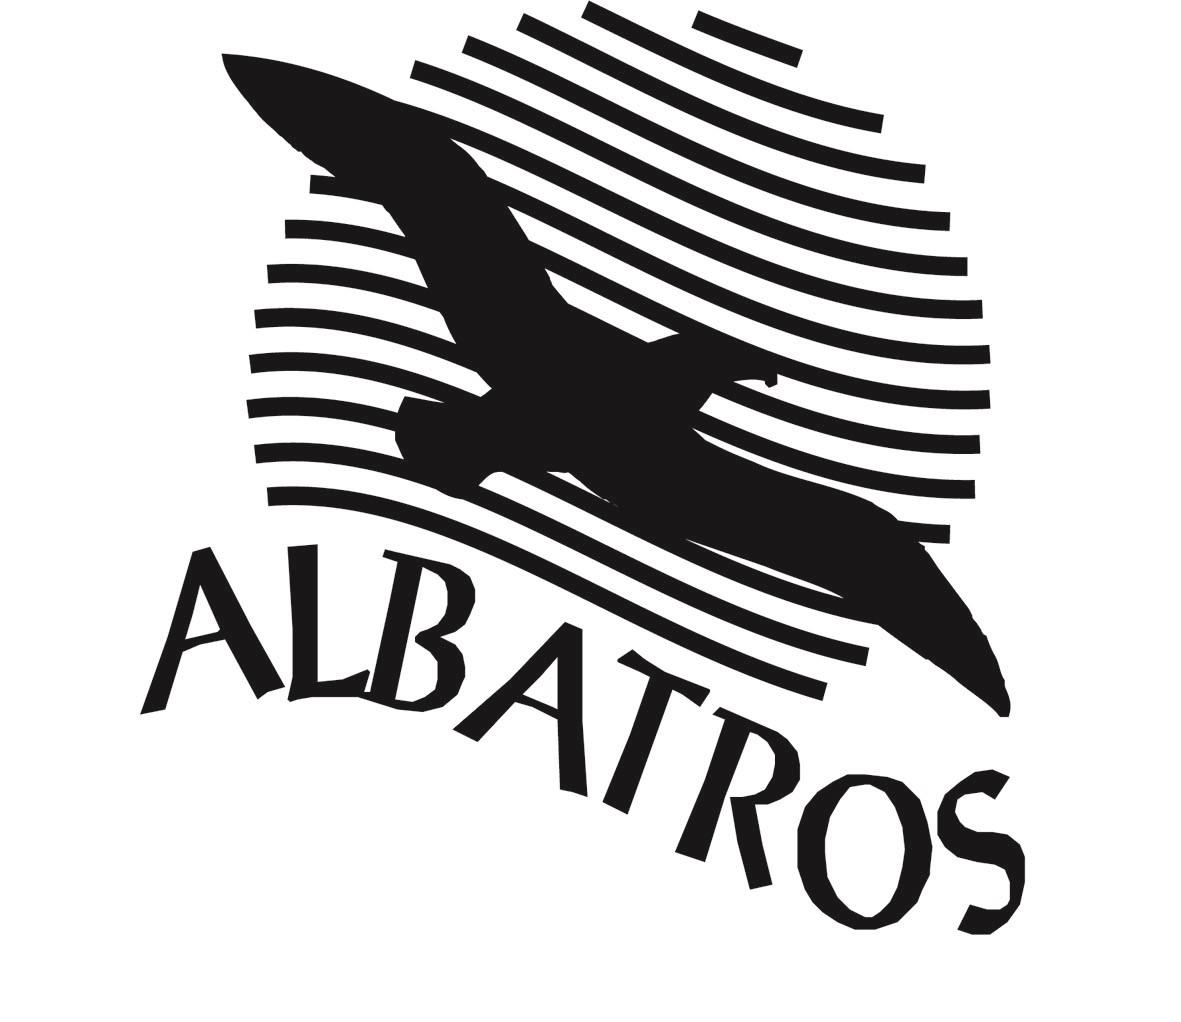 albatros-wydawnictwo-logo.jpg